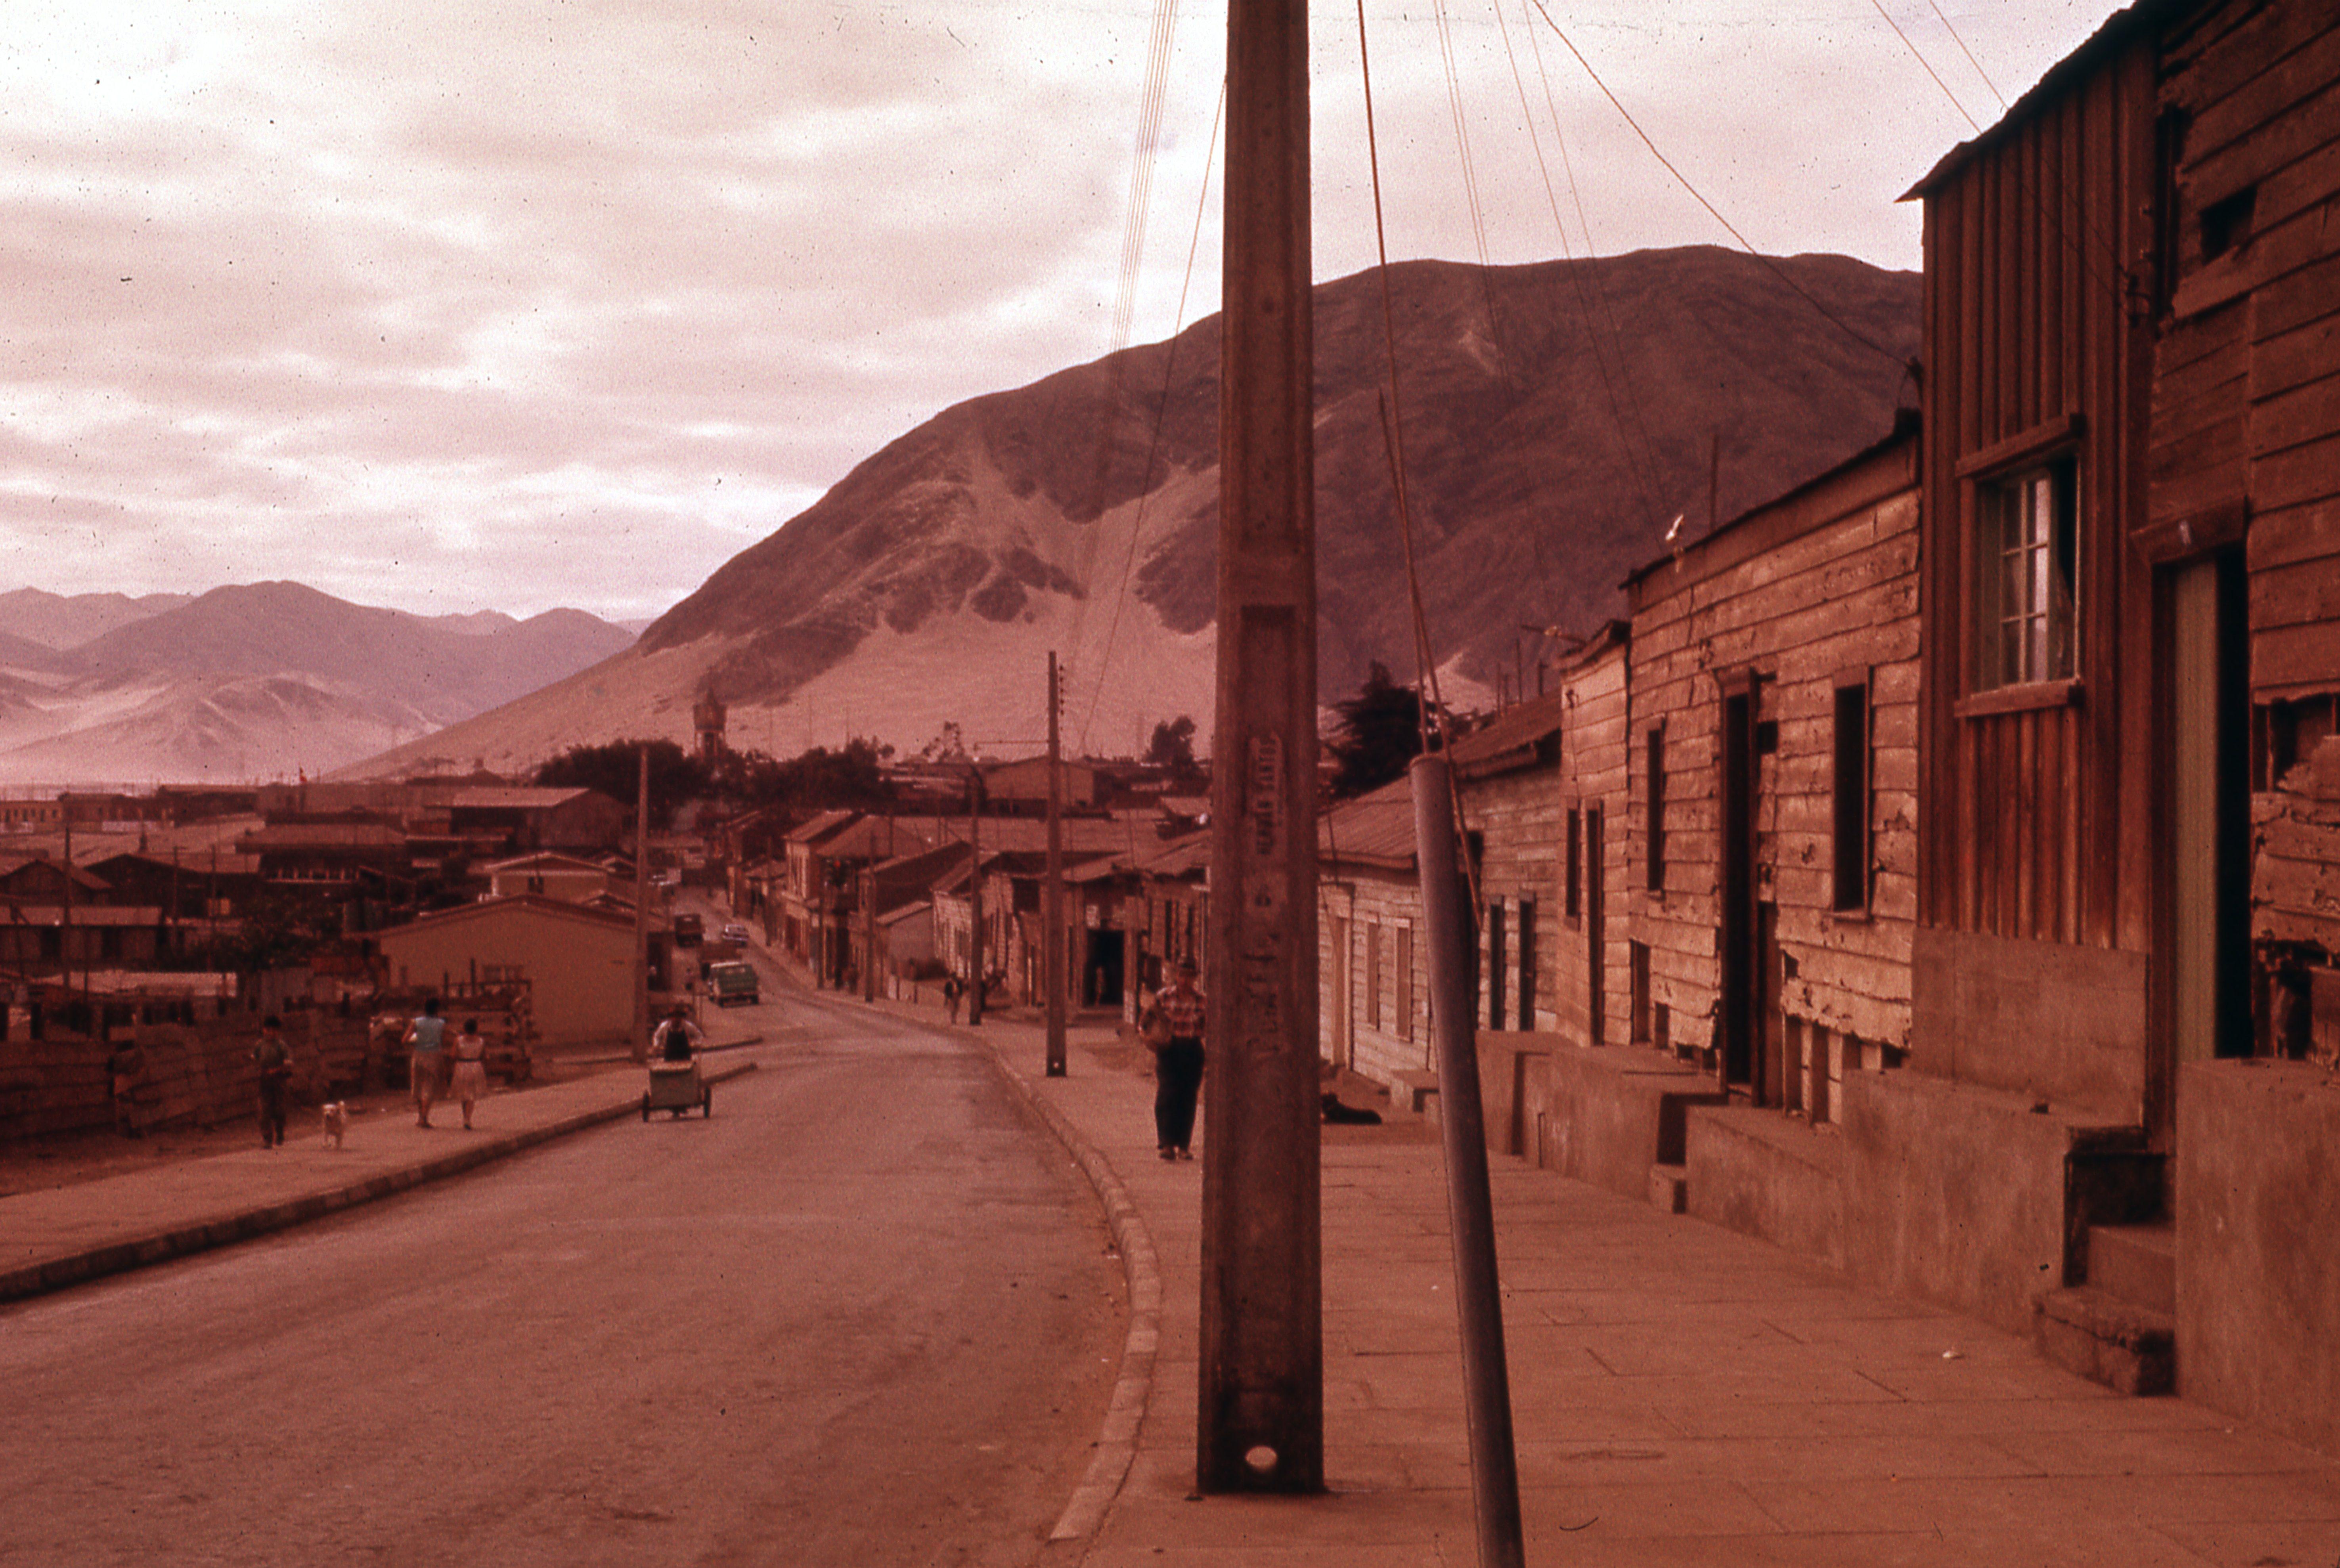 Enterreno - Fotos históricas de chile - fotos antiguas de Chile - FChañaral, 1977